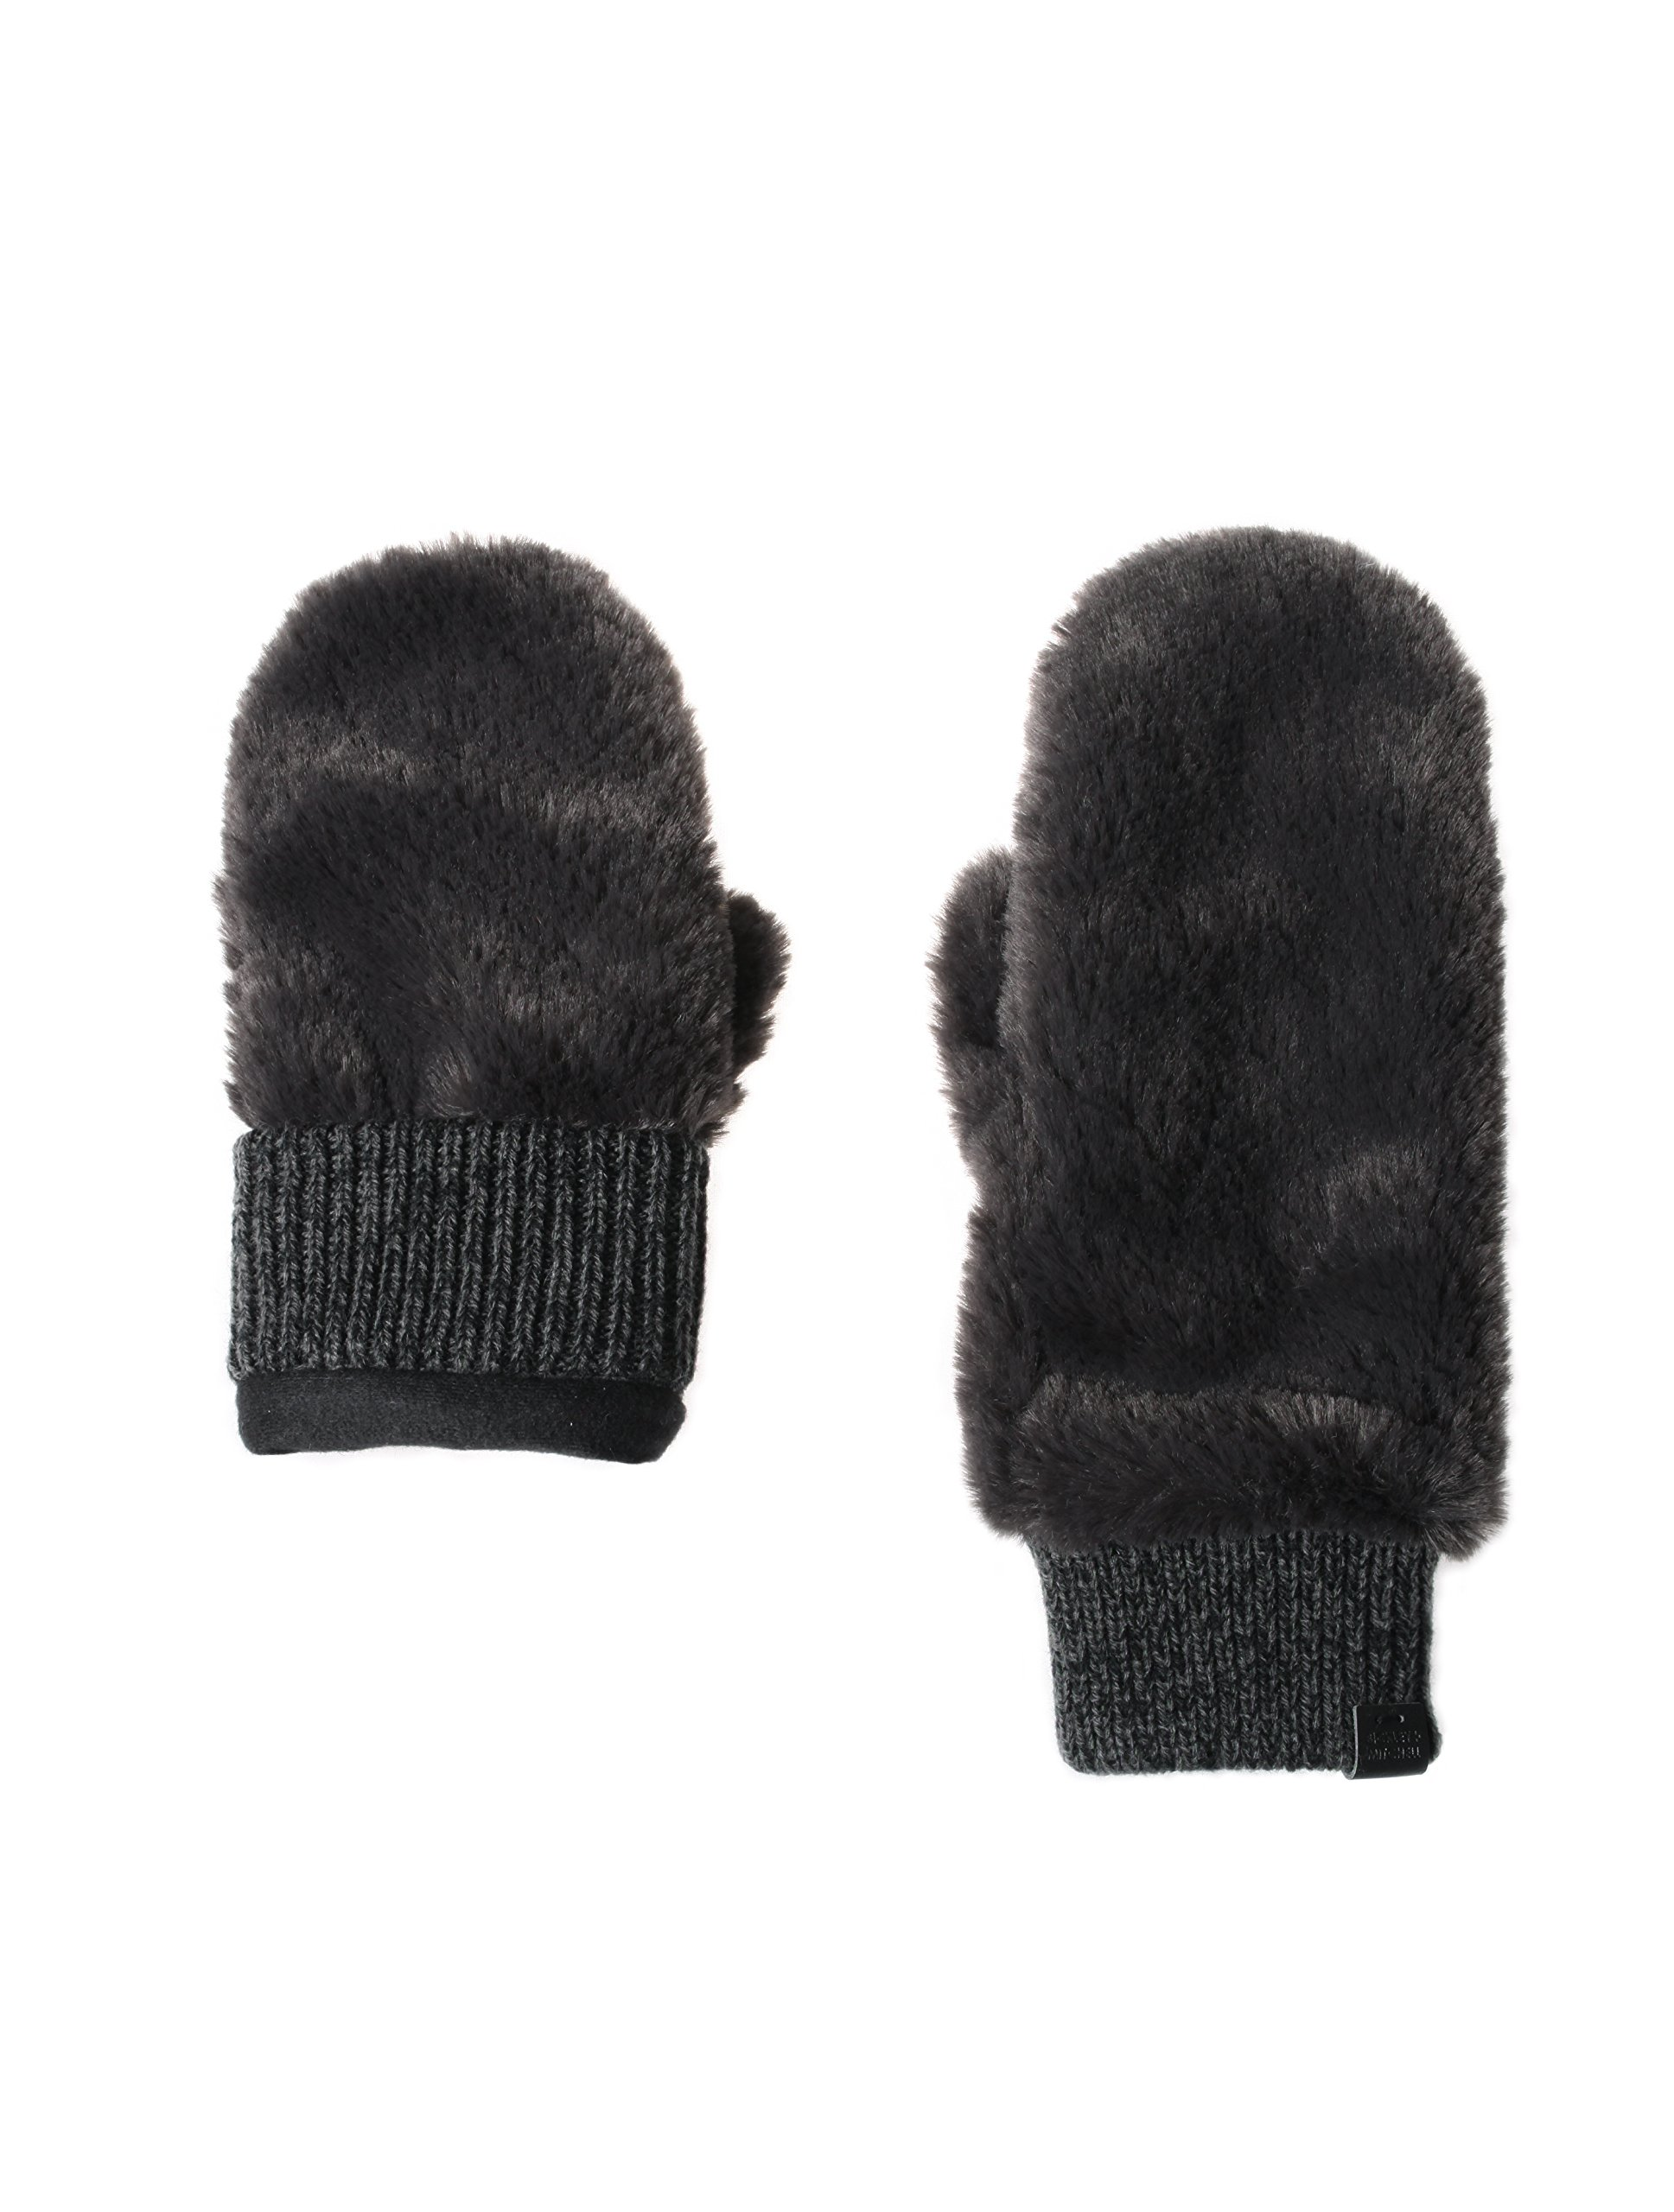 Bickley & Mitchell Women's Faux Fur Mittens, grey, ONE SIZE